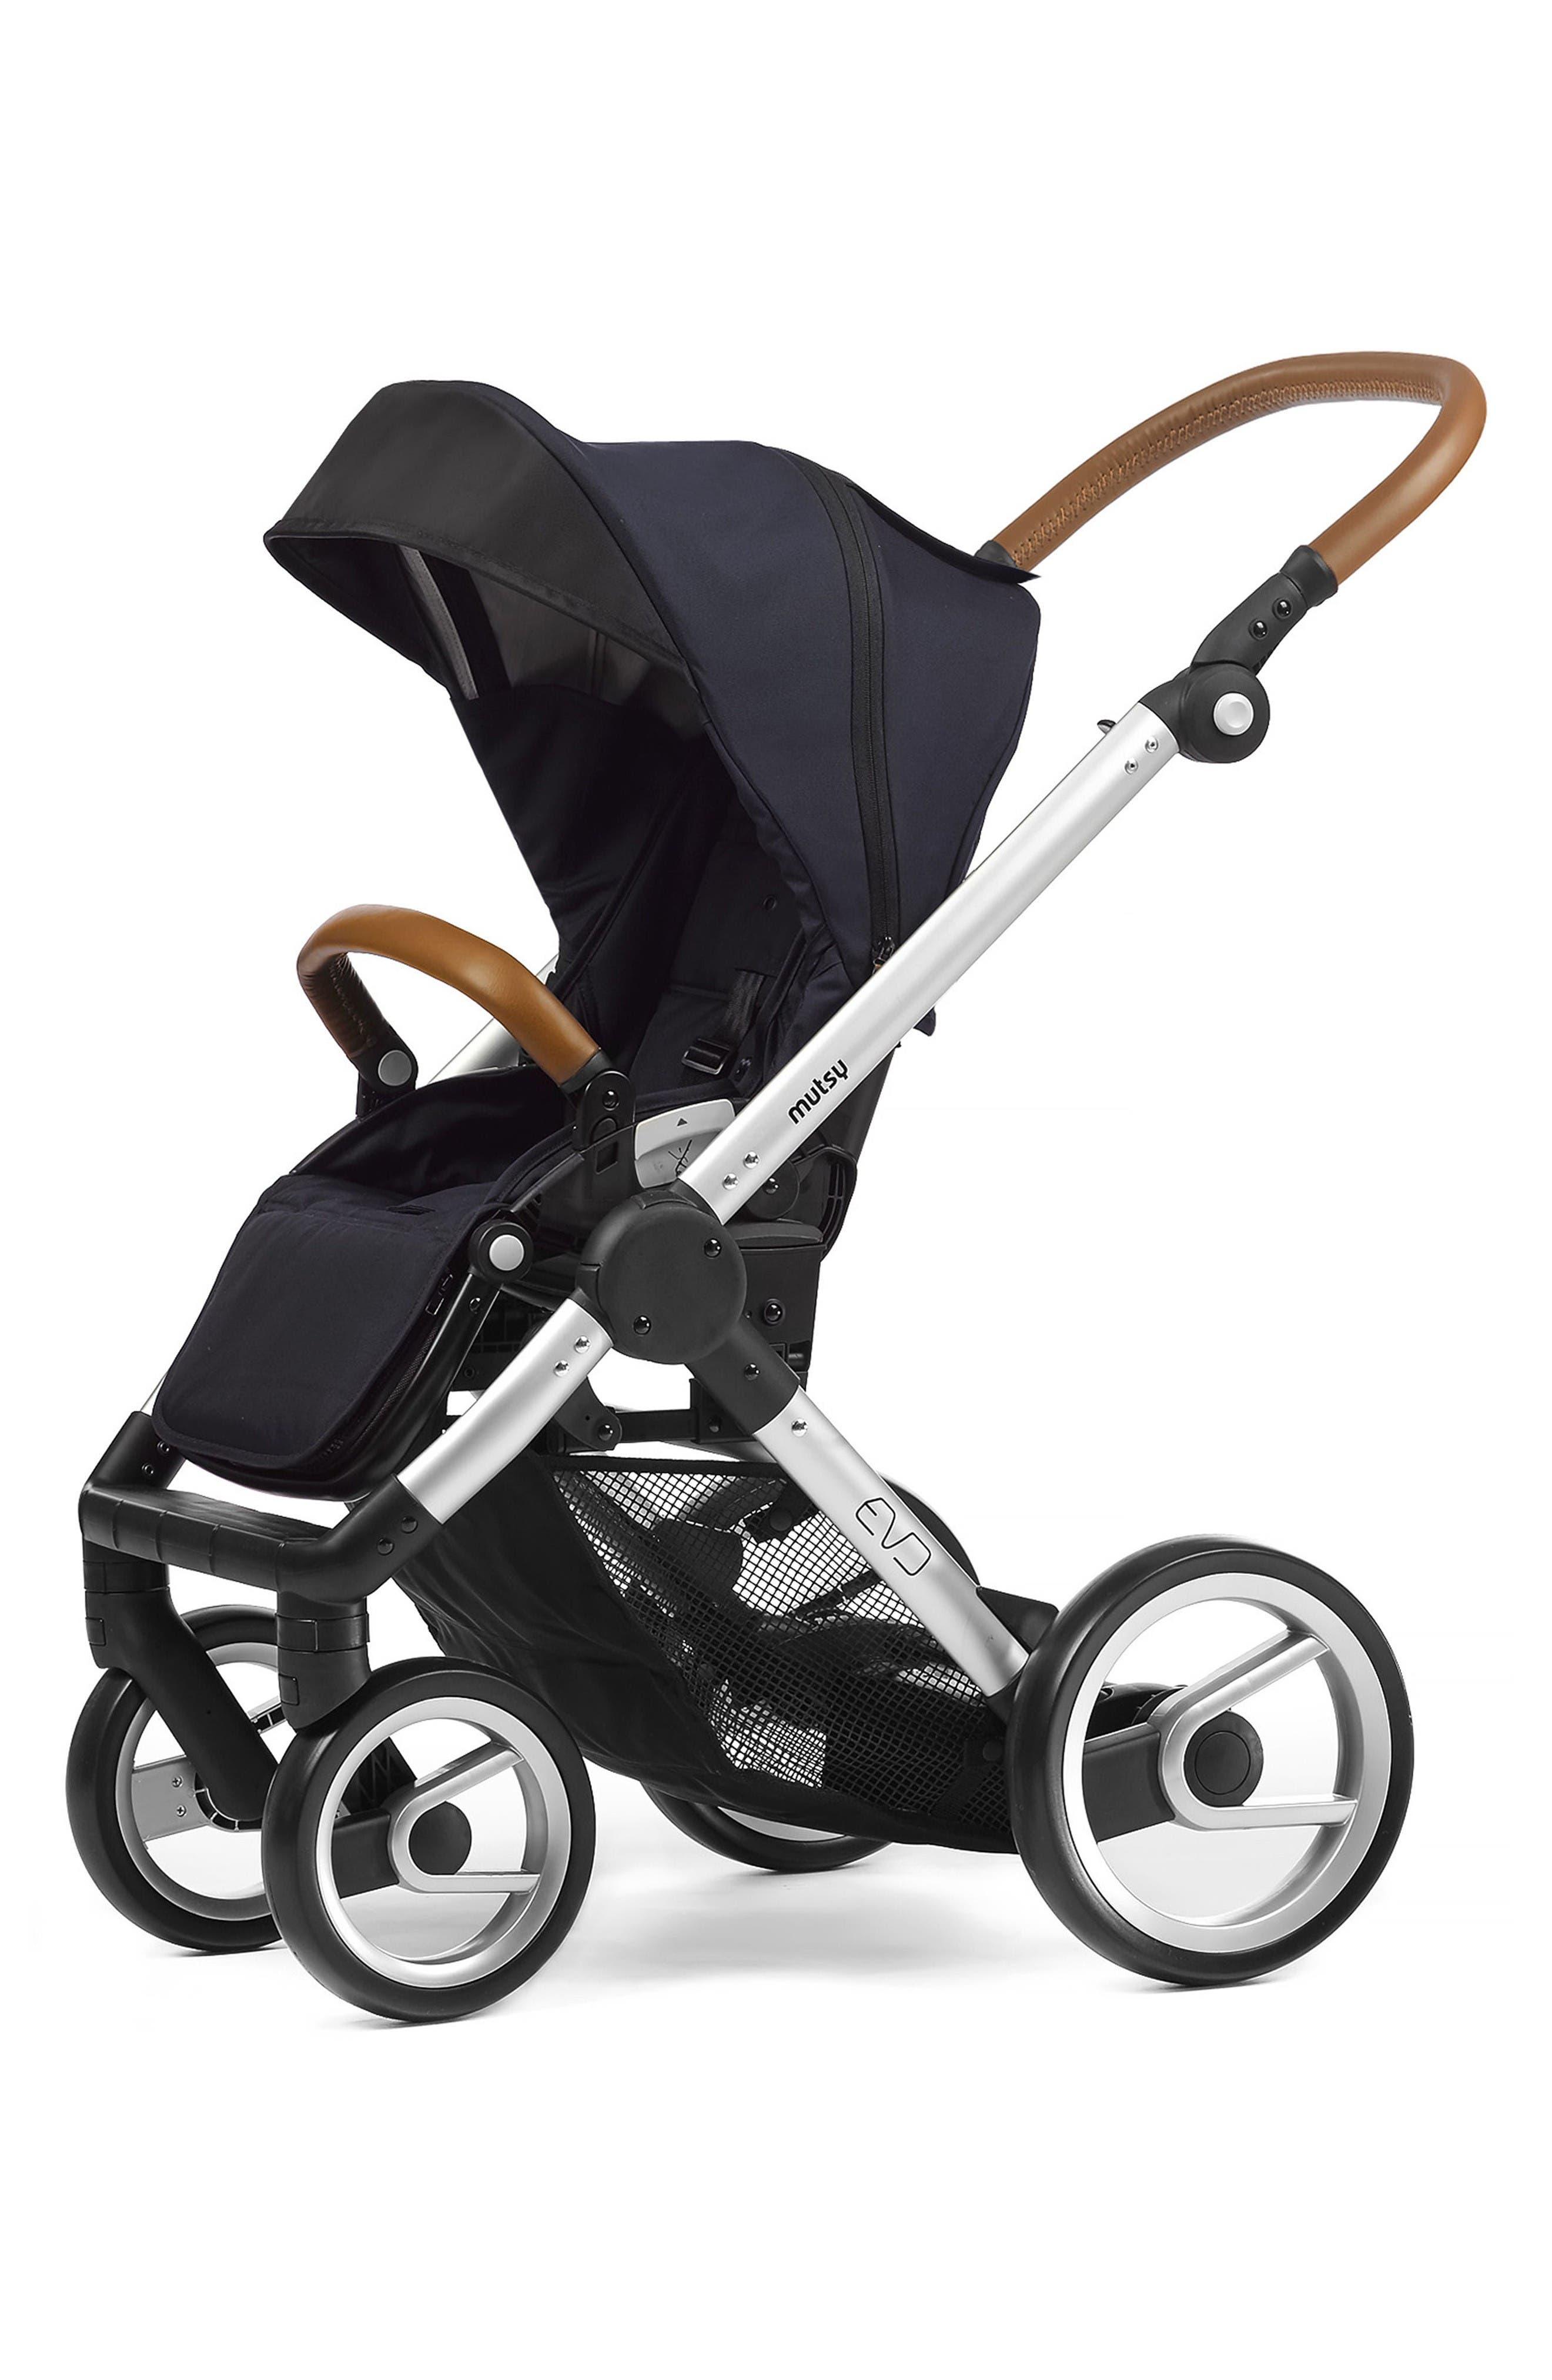 Evo - Urban Nomad Stroller,                             Main thumbnail 1, color,                             Silver/ Blue